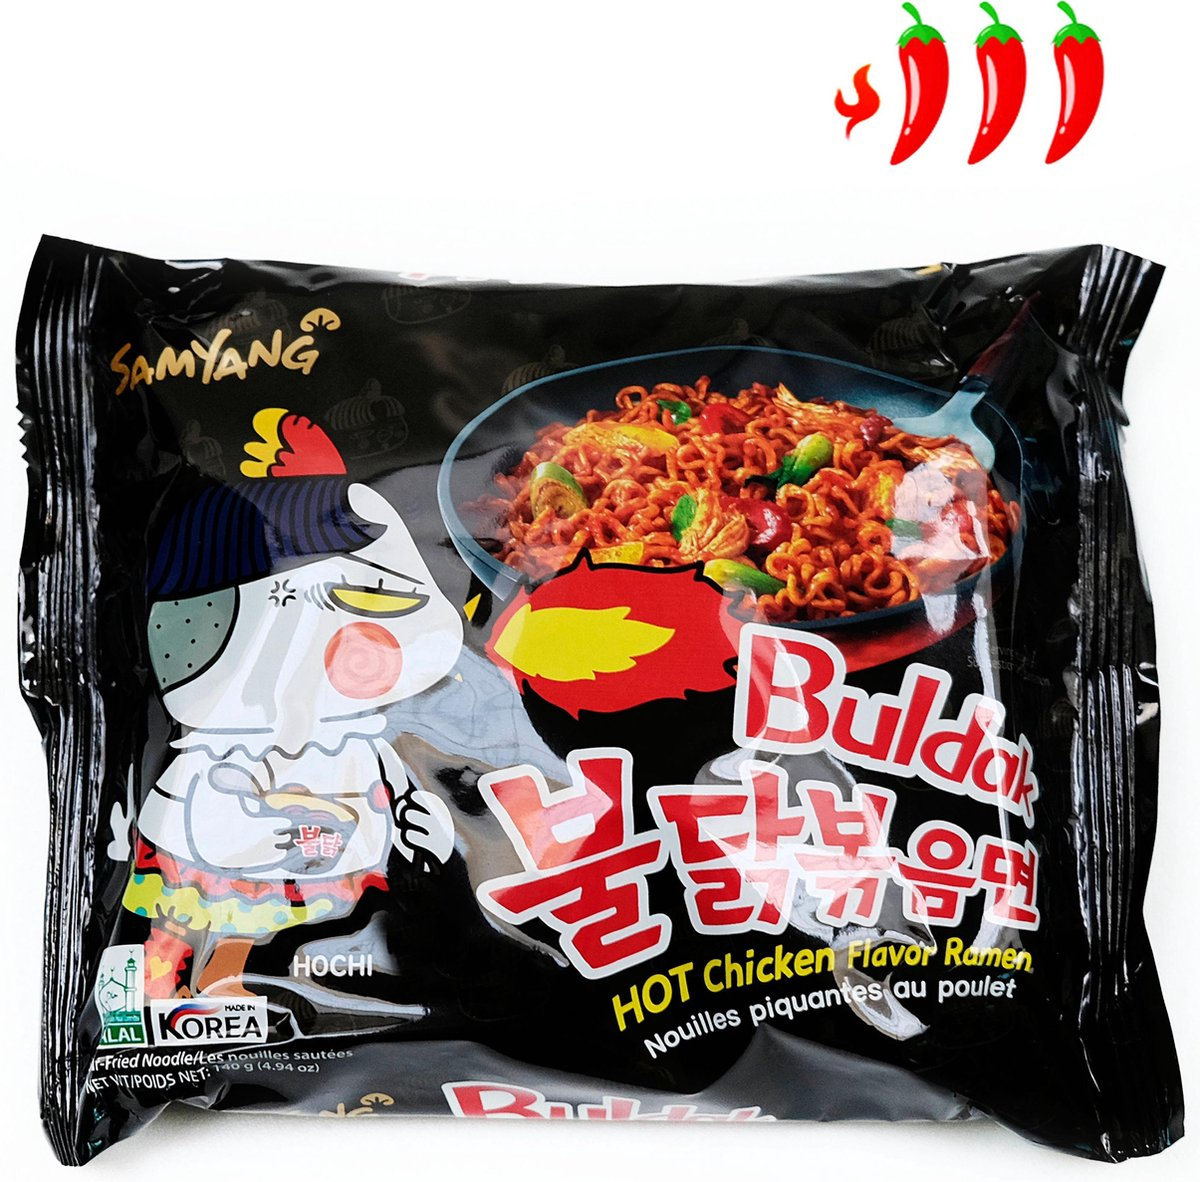 Hot Chicken Ramen Korean Samyang Extremely Spicy Buldak Noodle / Pikante Noedels ( 1x 140g)